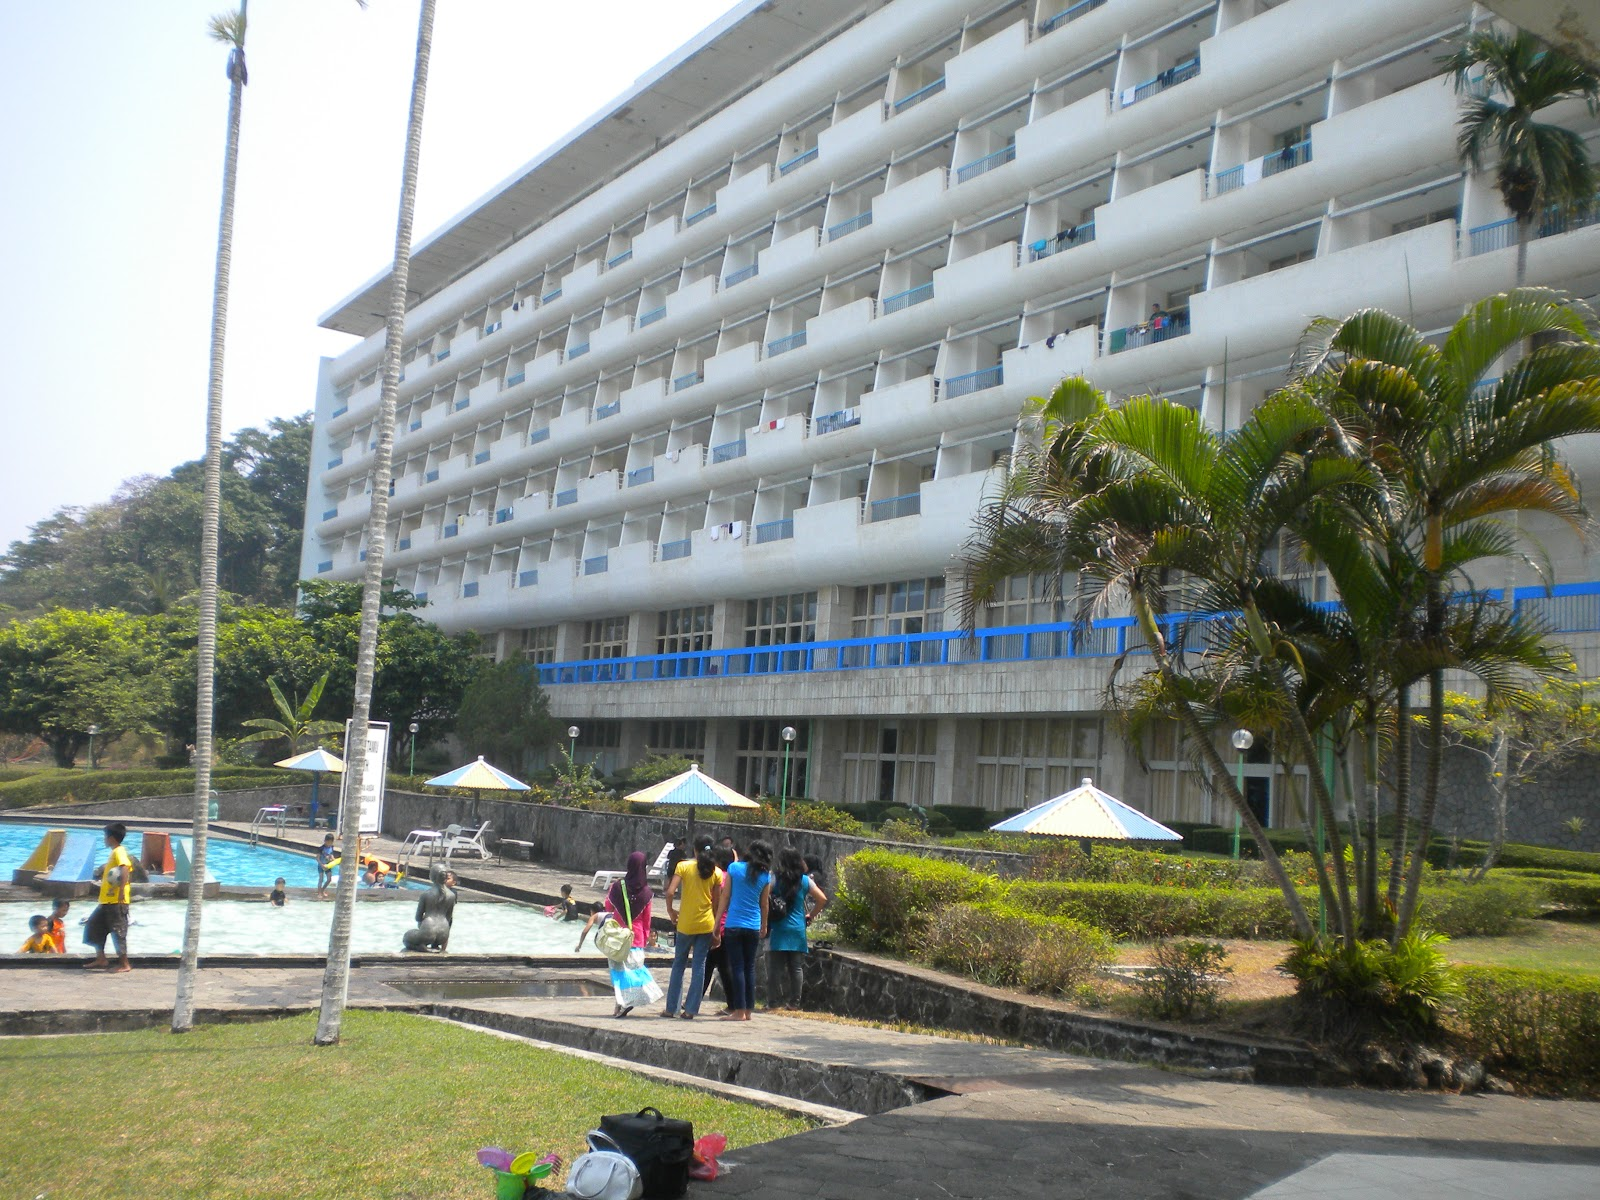 Samudra Beach Hotel Adalah Suatu Badan Usaha Milik Negara Dibangun Tahun 1962 Dan Selesai Akhir 1965 3 Bulan Lebih Cepat Dari Waktu Yang Telah